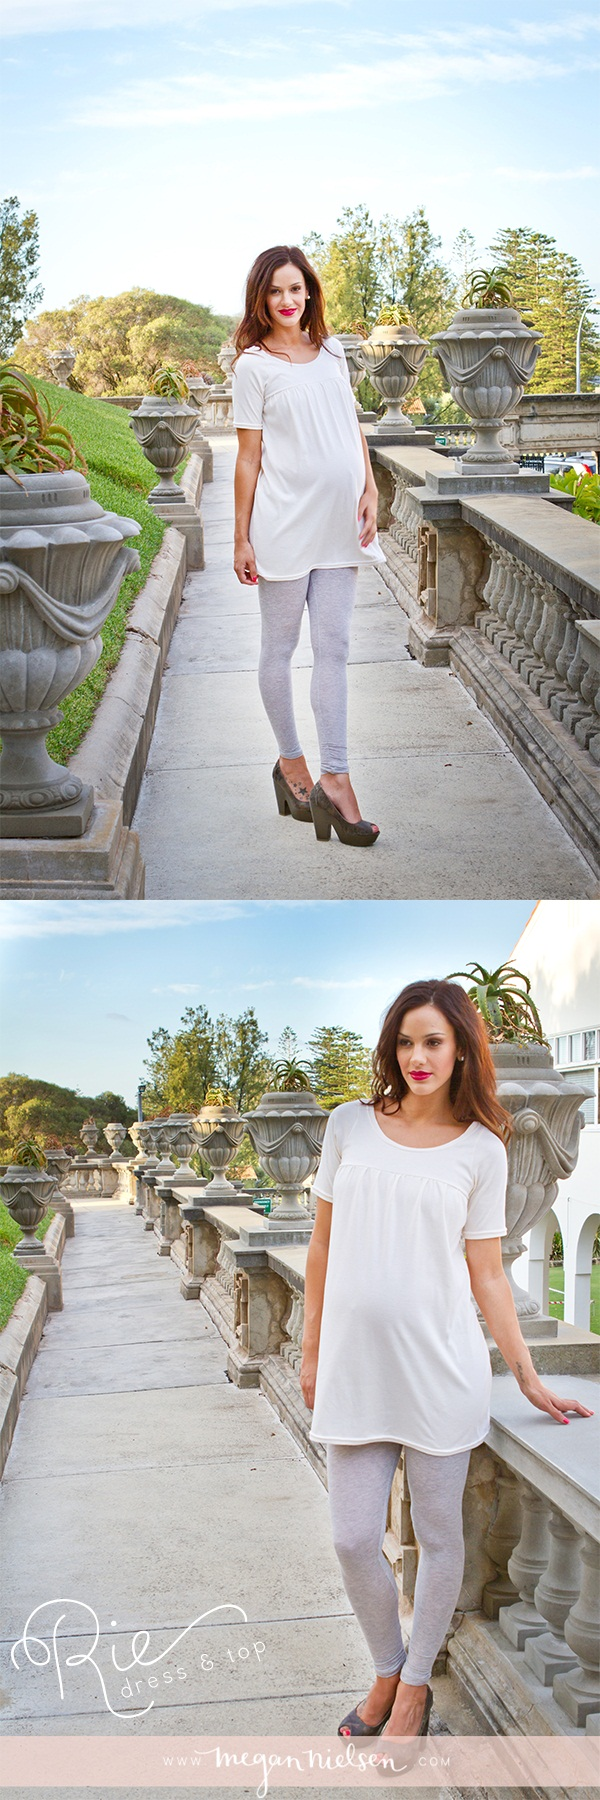 Megan Nielsen Rie Dress & Top MN1005